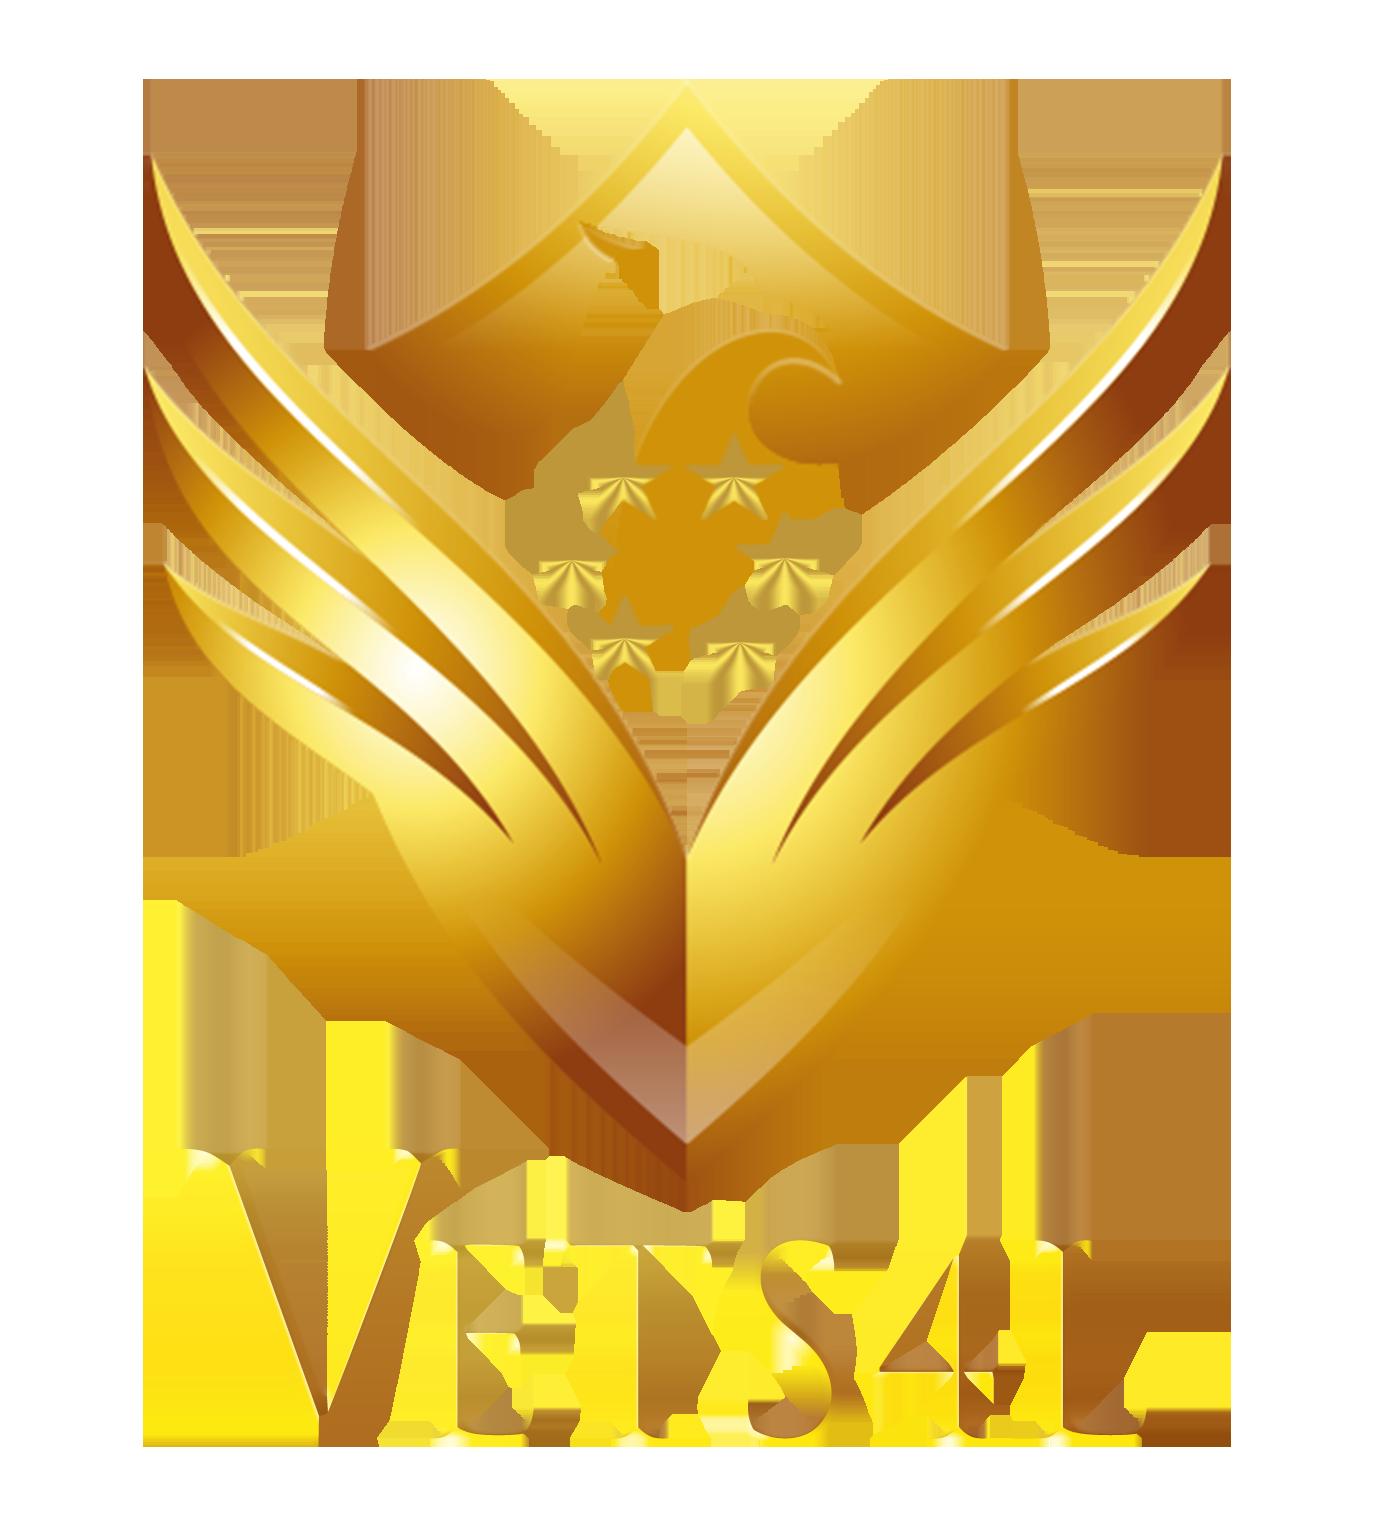 Vets 4 Life logo